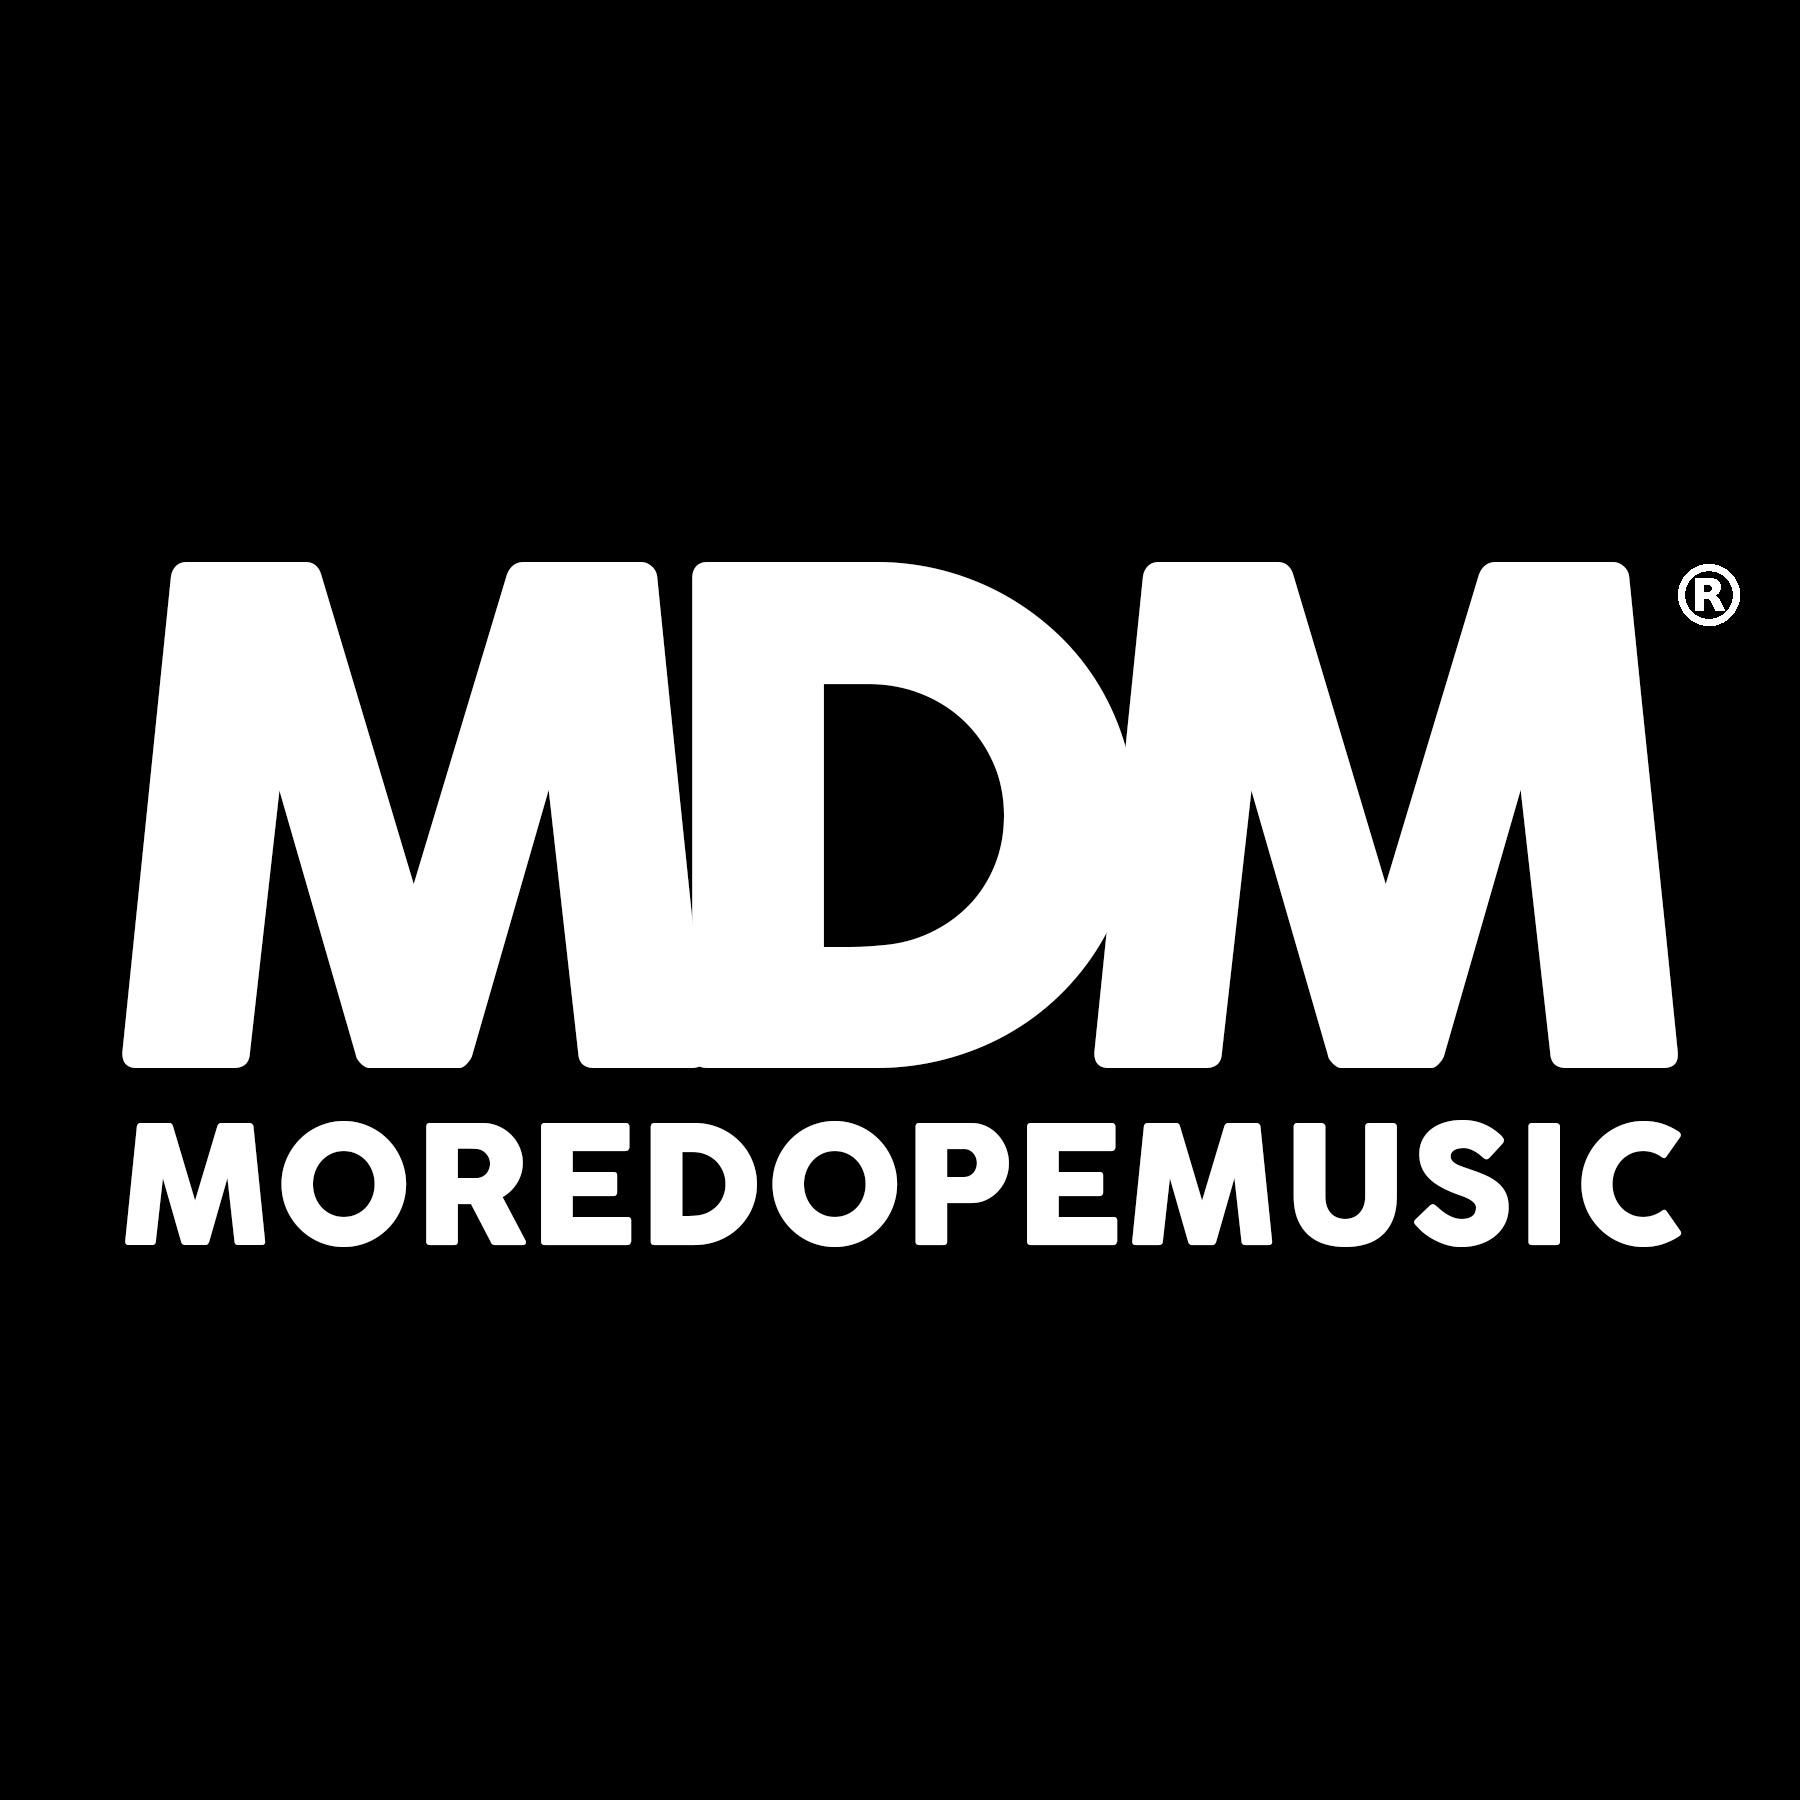 Db2htzkrjsvxhbqyxcpt_moredopemusic_logo_white_black